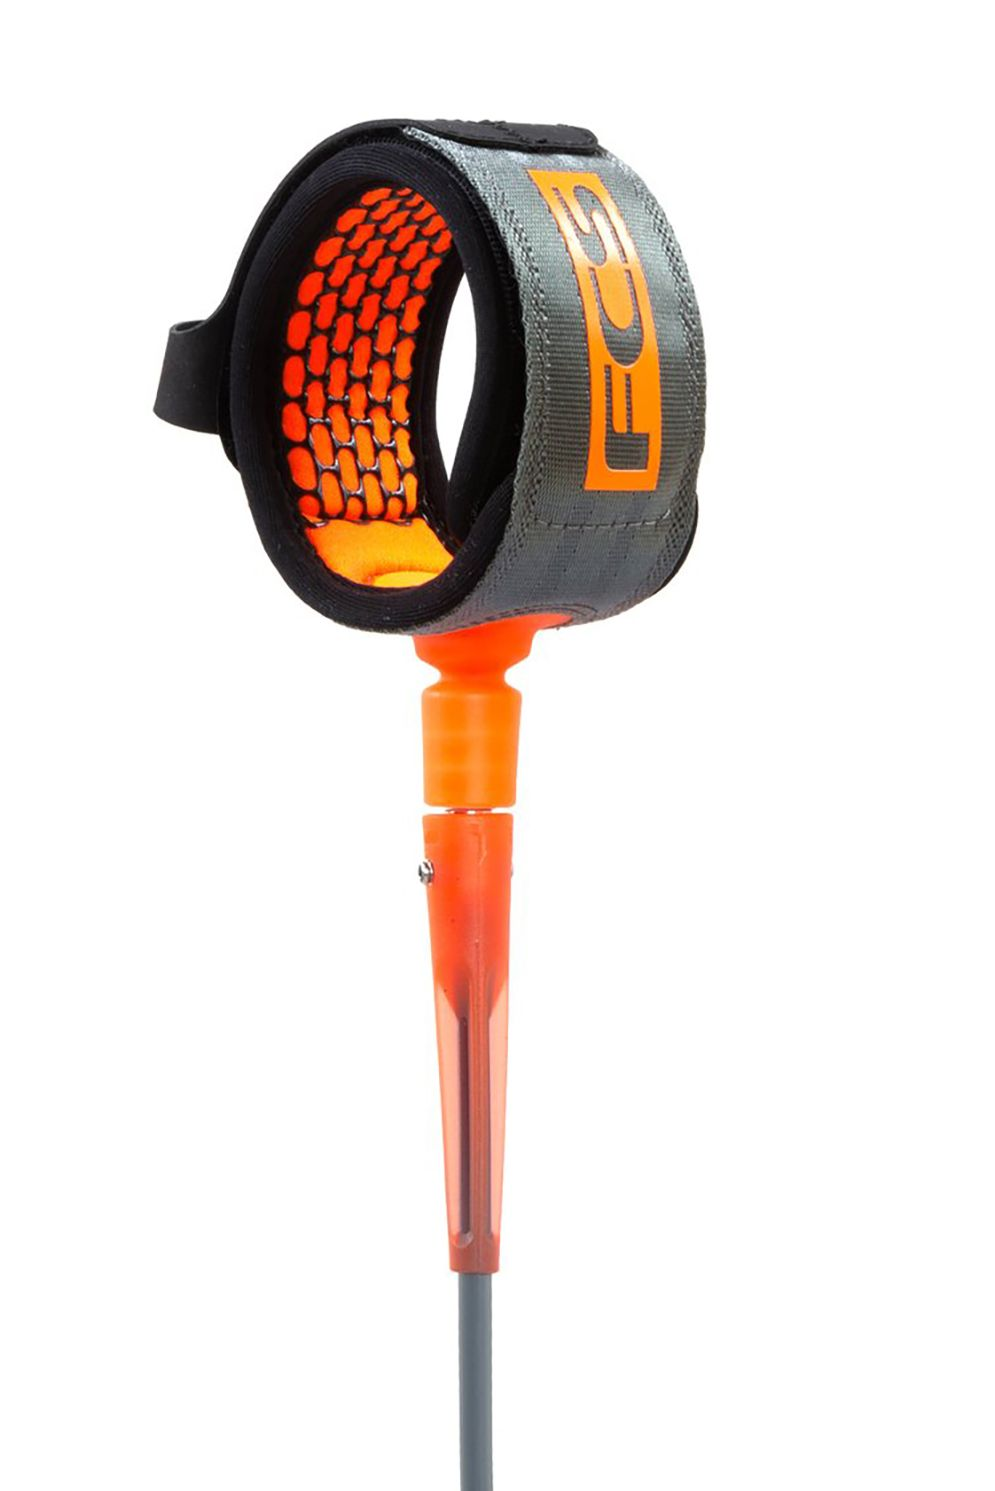 Fcs Leash 6' COMP ESSENTIAL Charcoal/Blood Orange